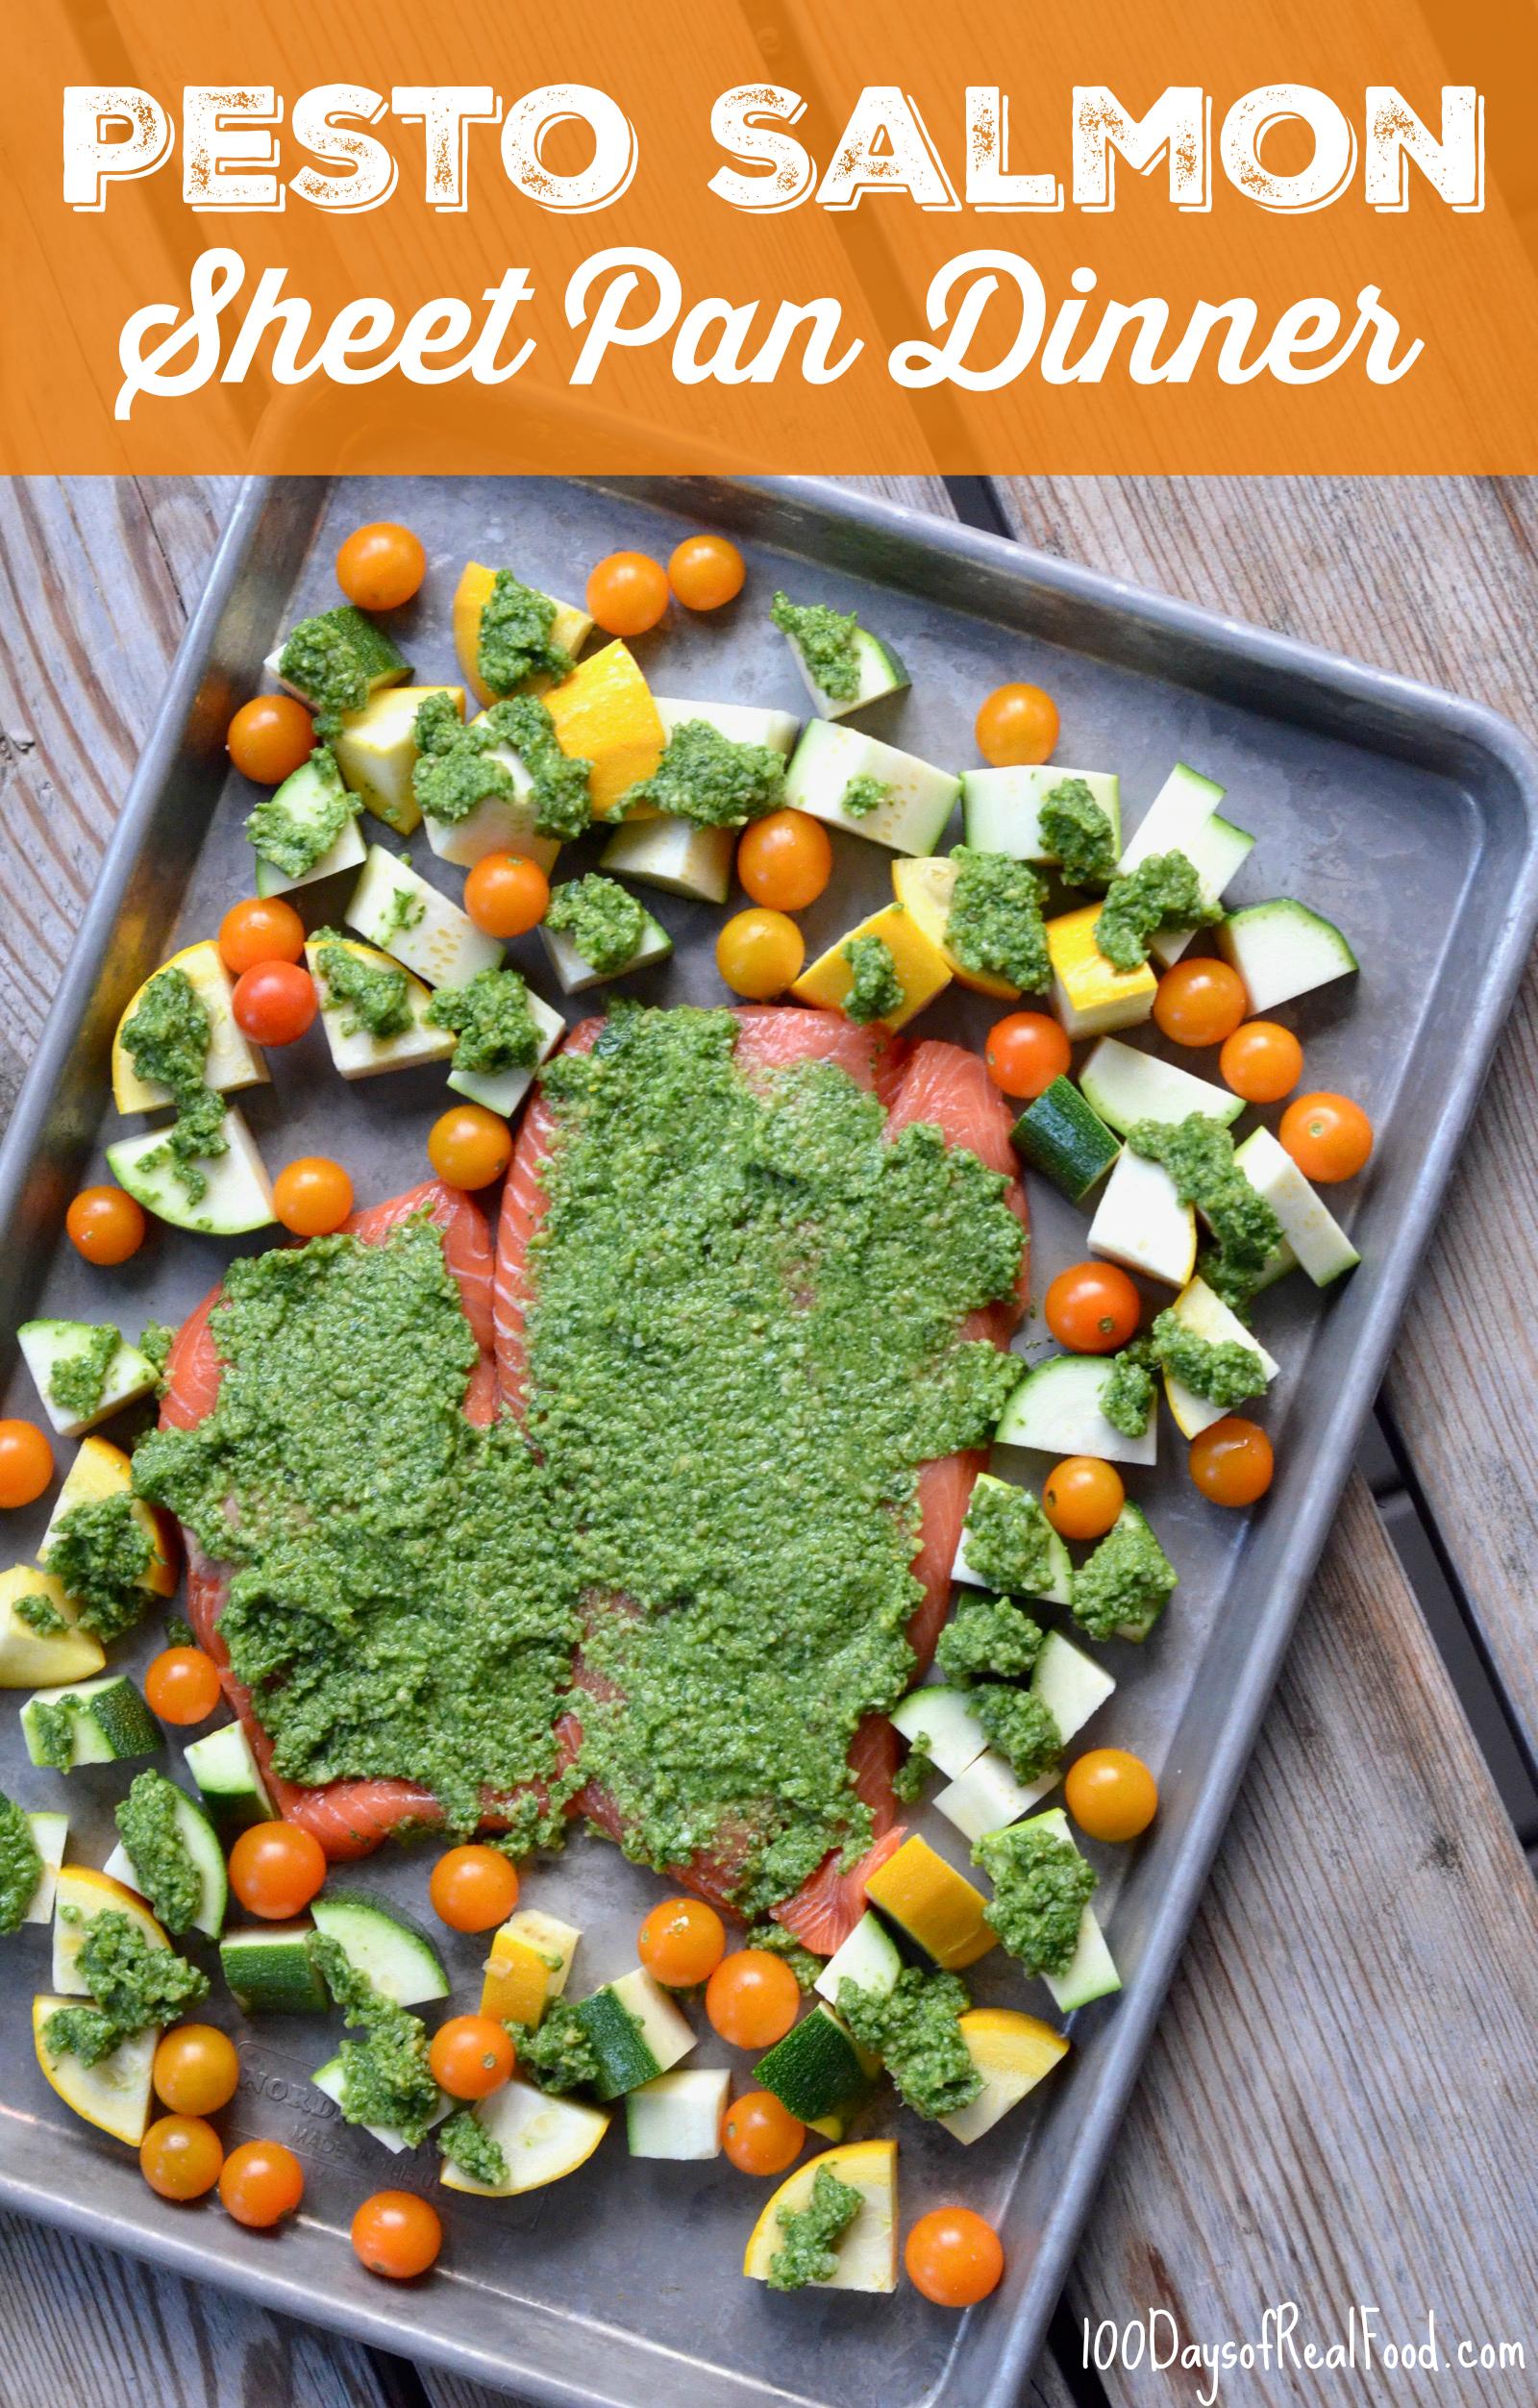 Pesto Salmon and vegetables on baking sheet